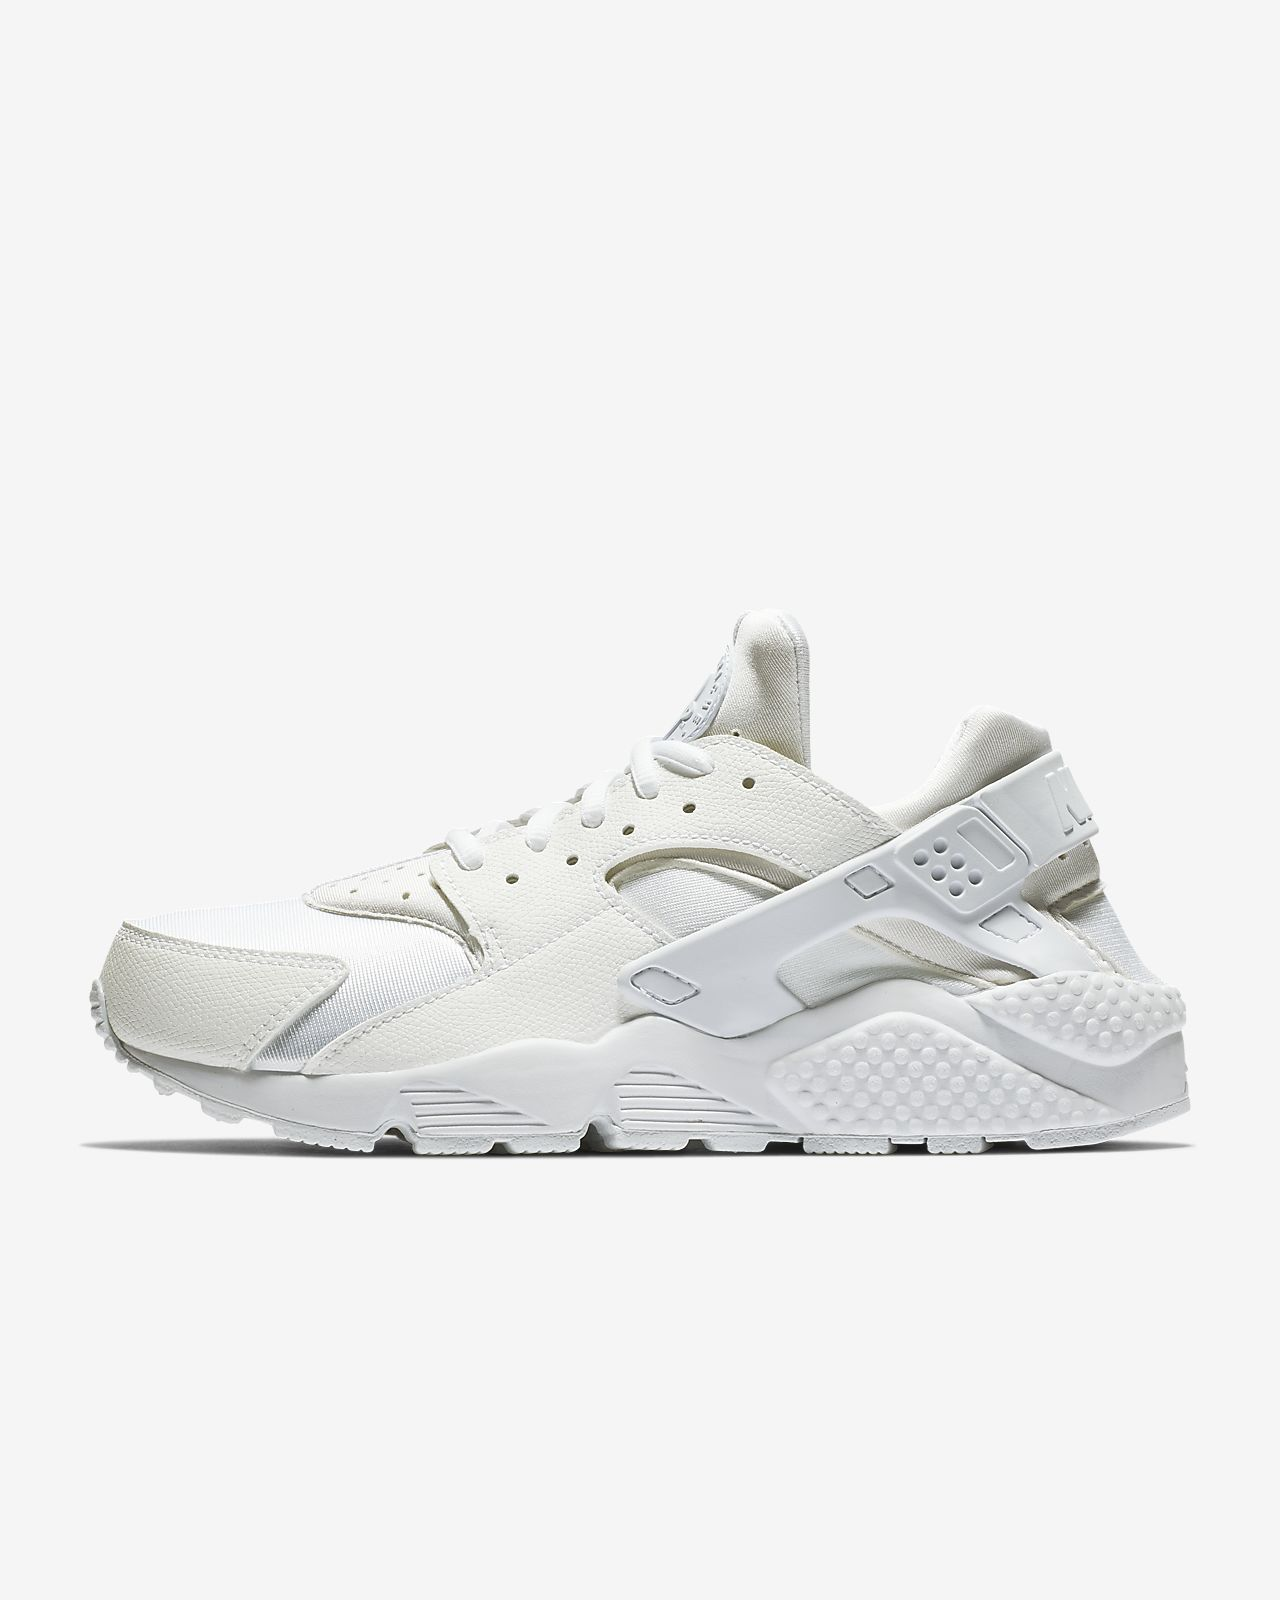 release date f6a13 45164 ... Calzado para mujer Nike Air Huarache